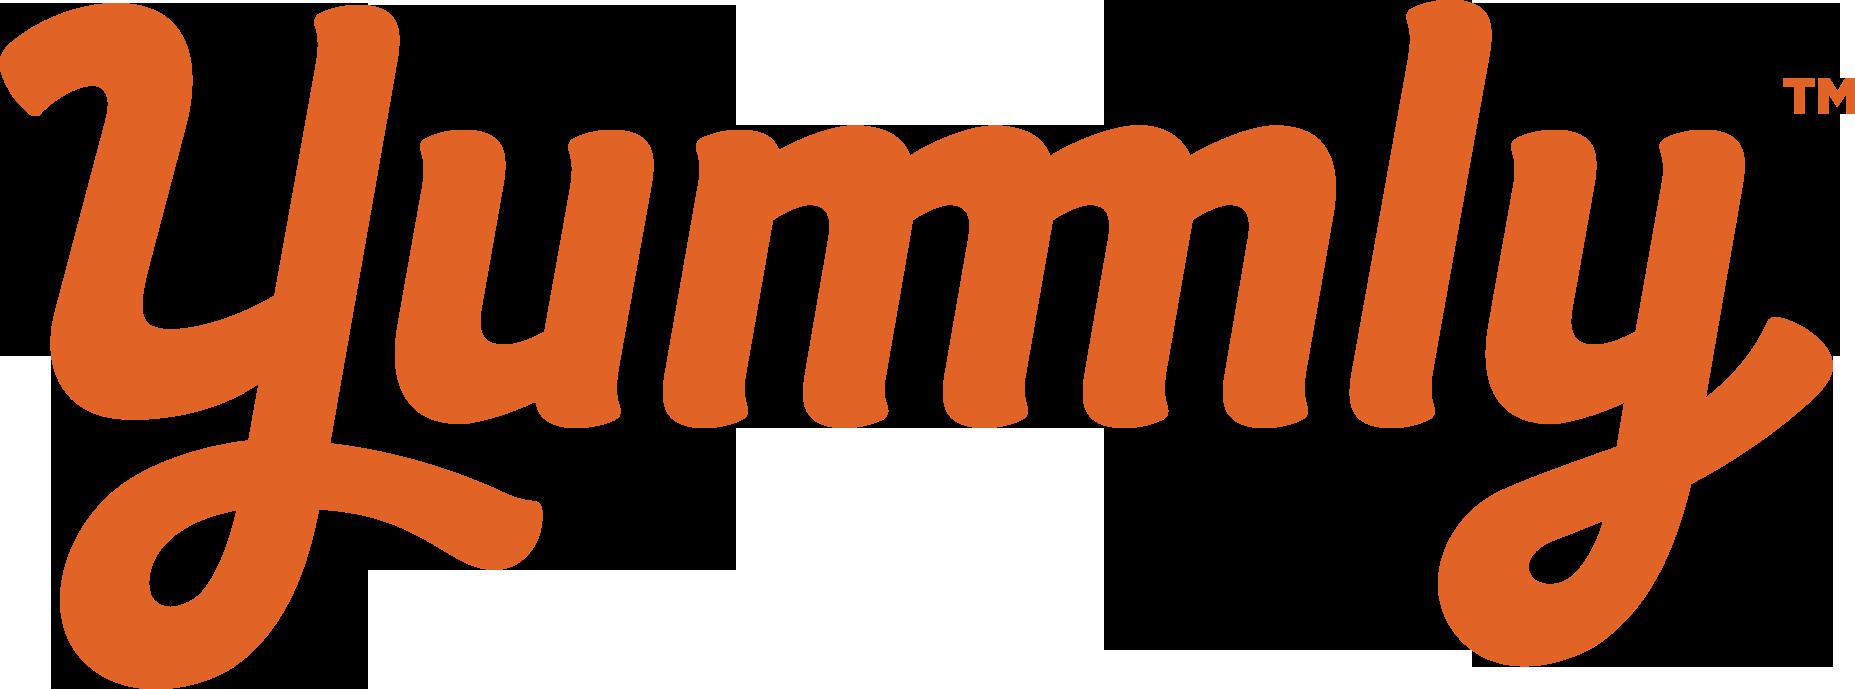 yummly-logo